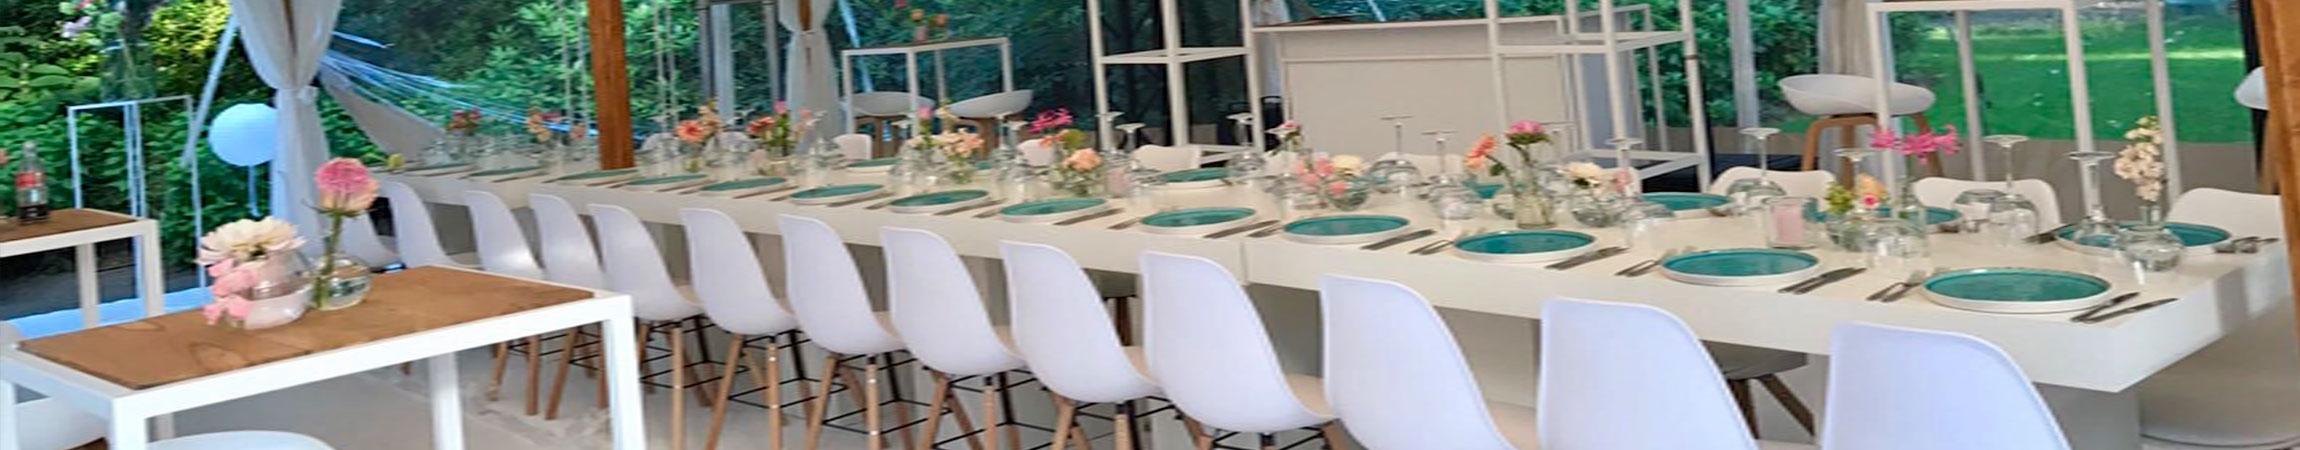 Bruiloft Oisterwijk